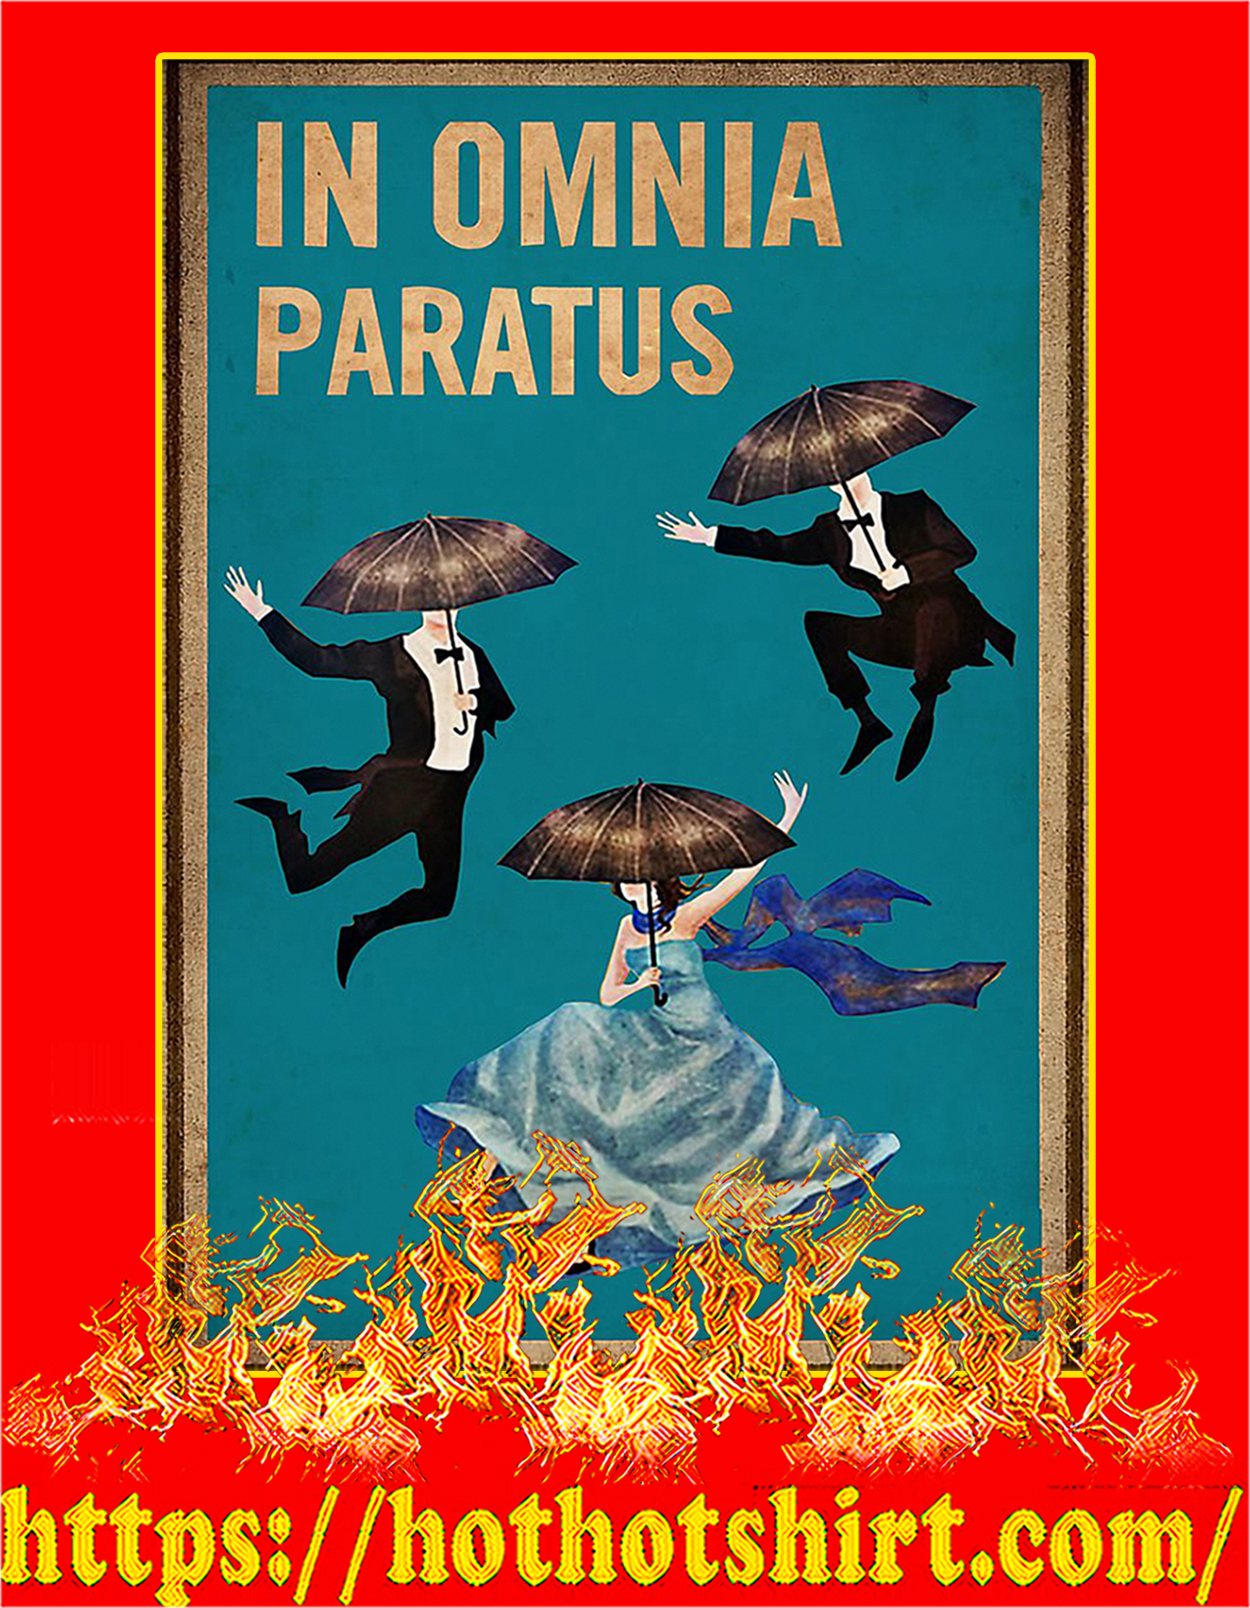 In omnia paratus poster - A3